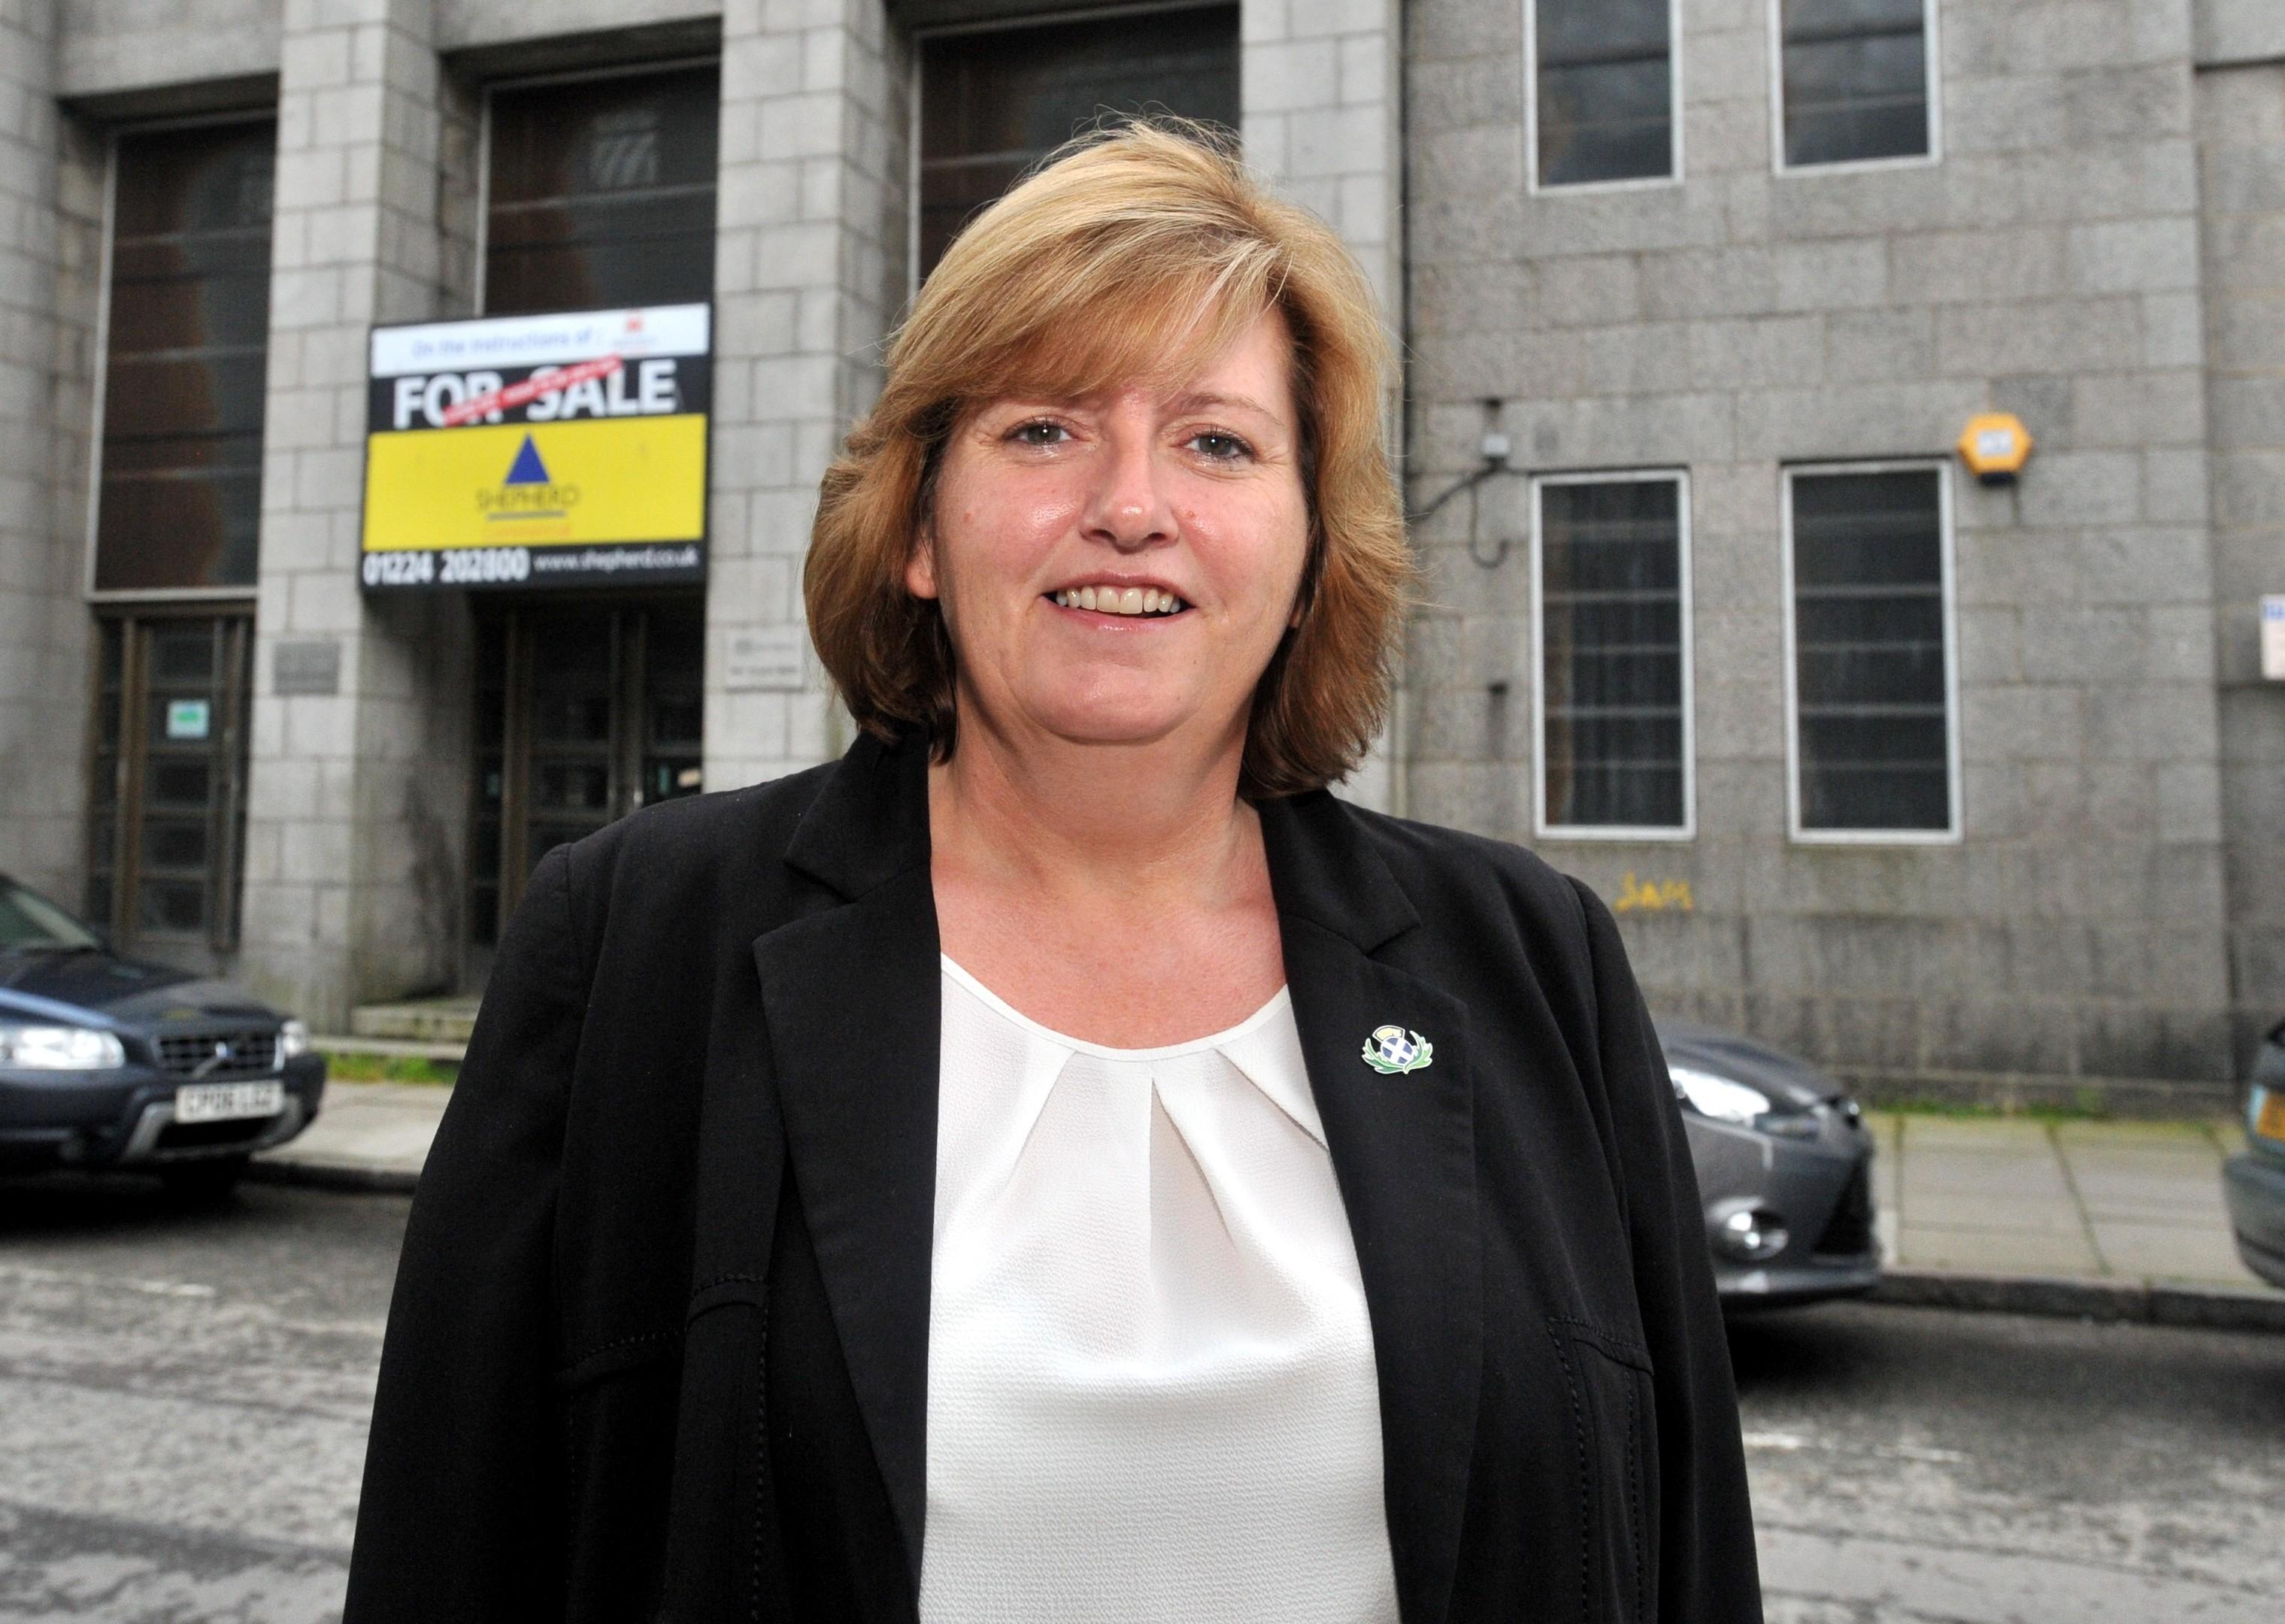 Councillor Jackie Dunbar has criticised Labour's spending.